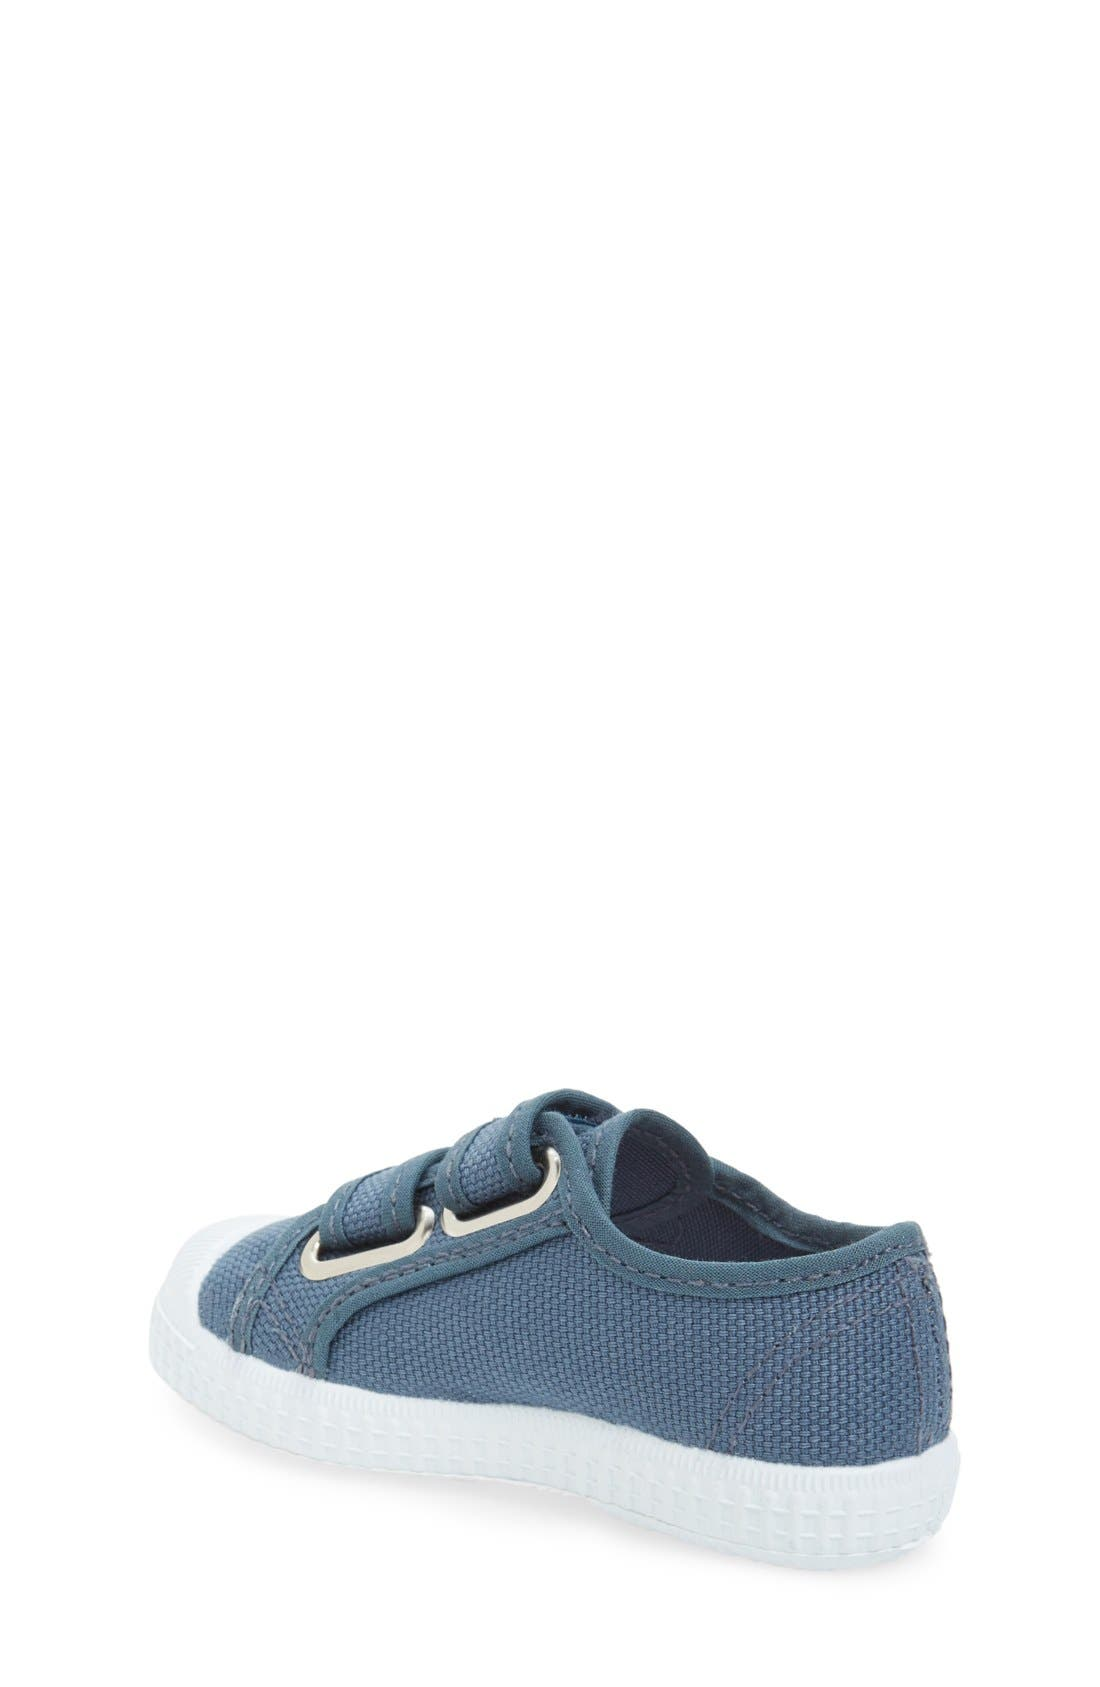 Canvas Sneaker,                             Alternate thumbnail 2, color,                             Grey